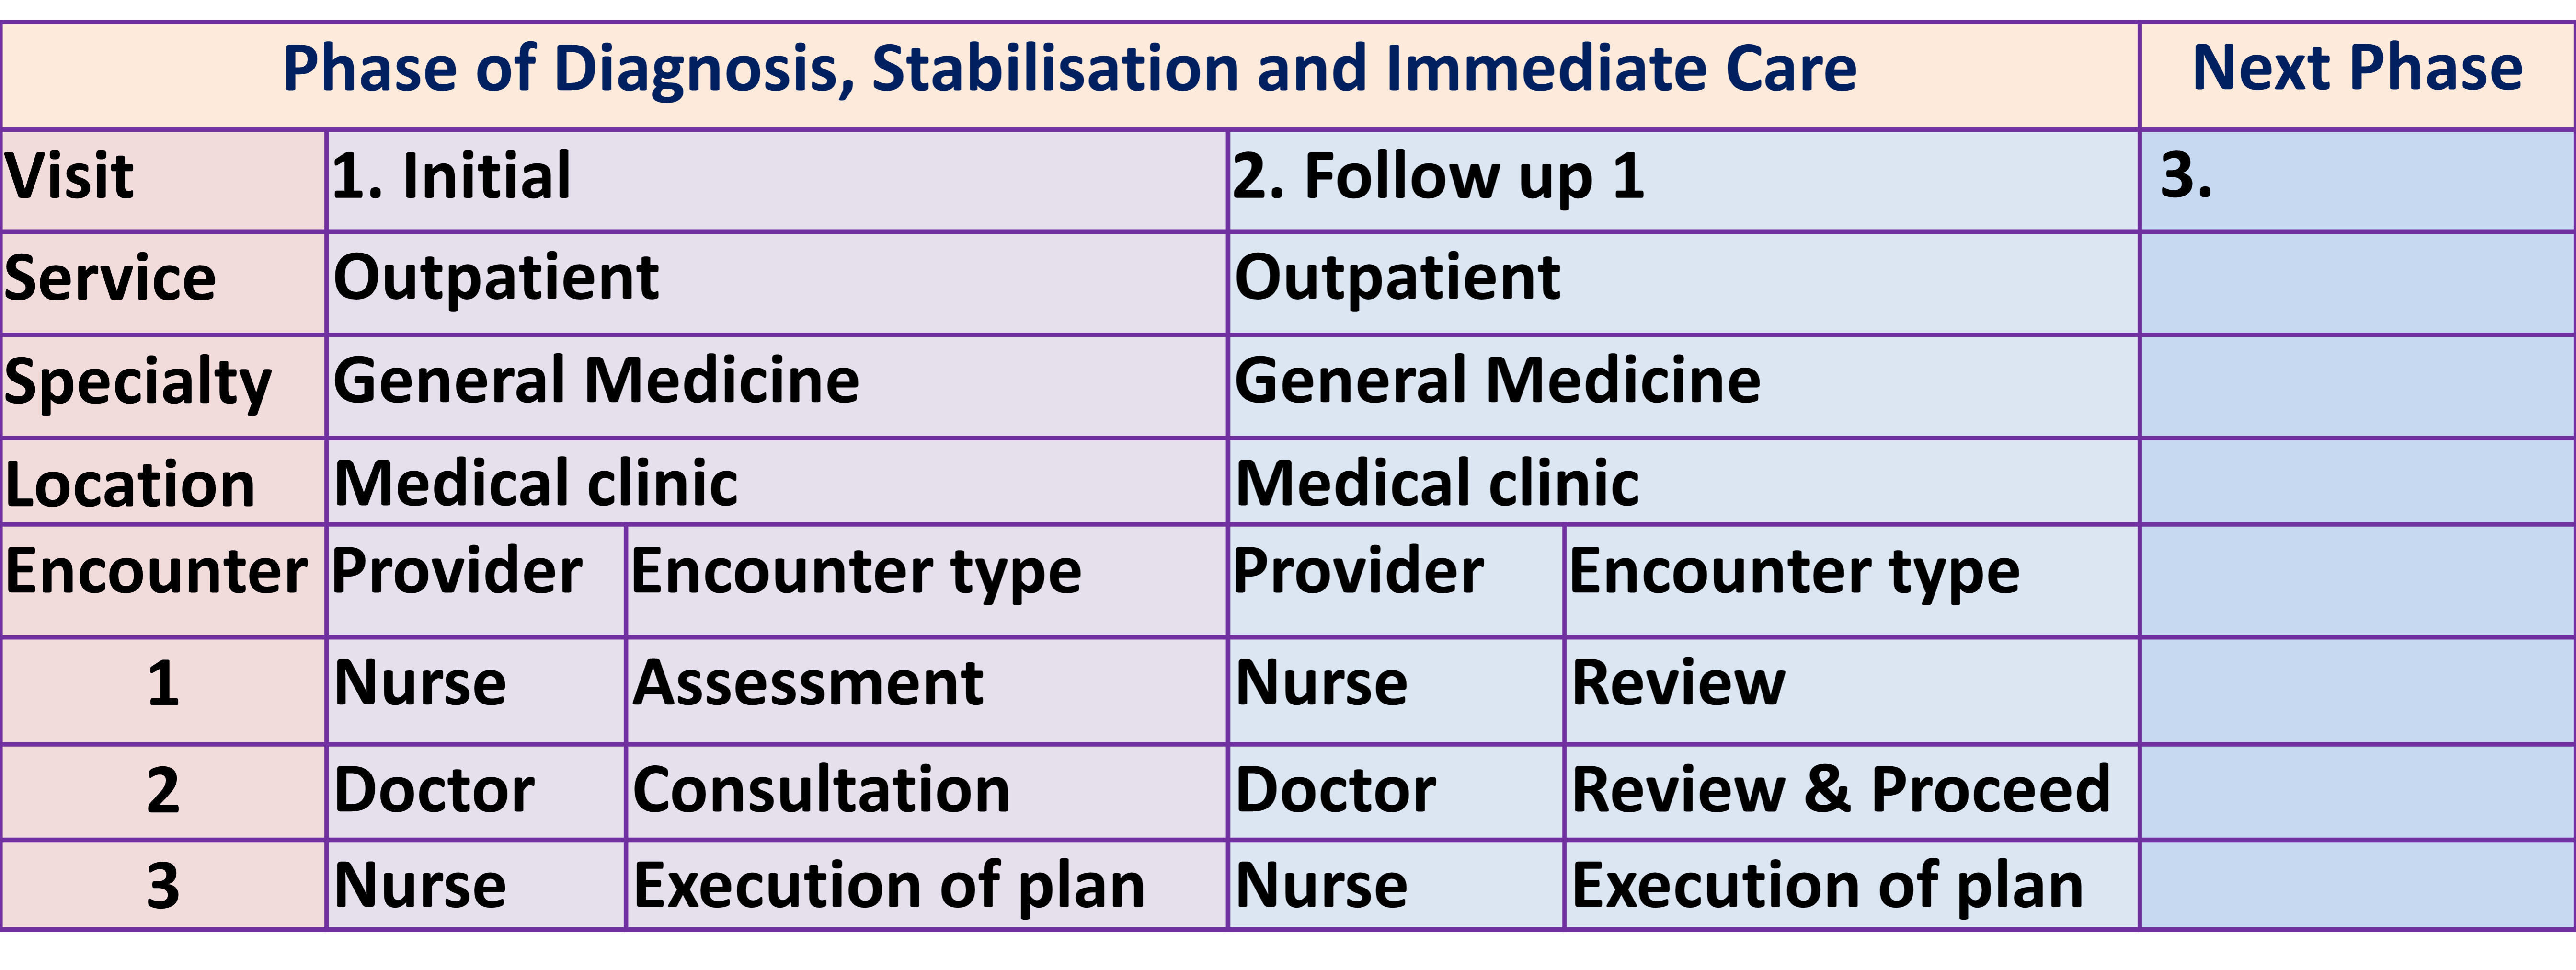 Care Schedule 2